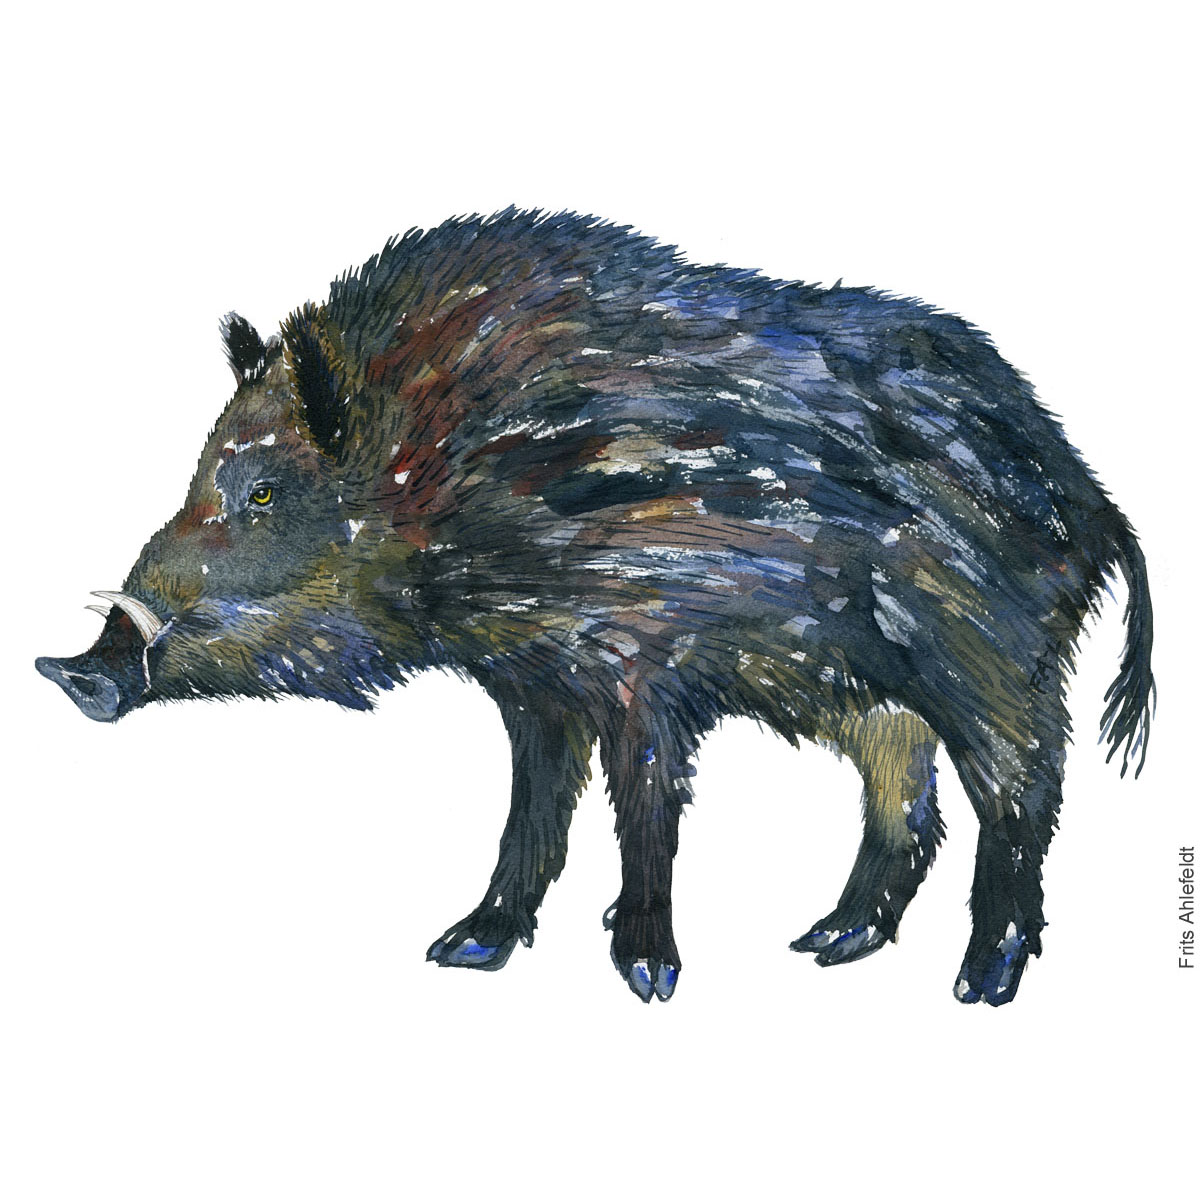 Watercolor of wild boar ( Sus-Scrofa, Vildsvin) Painting by Frits Ahlefeldt